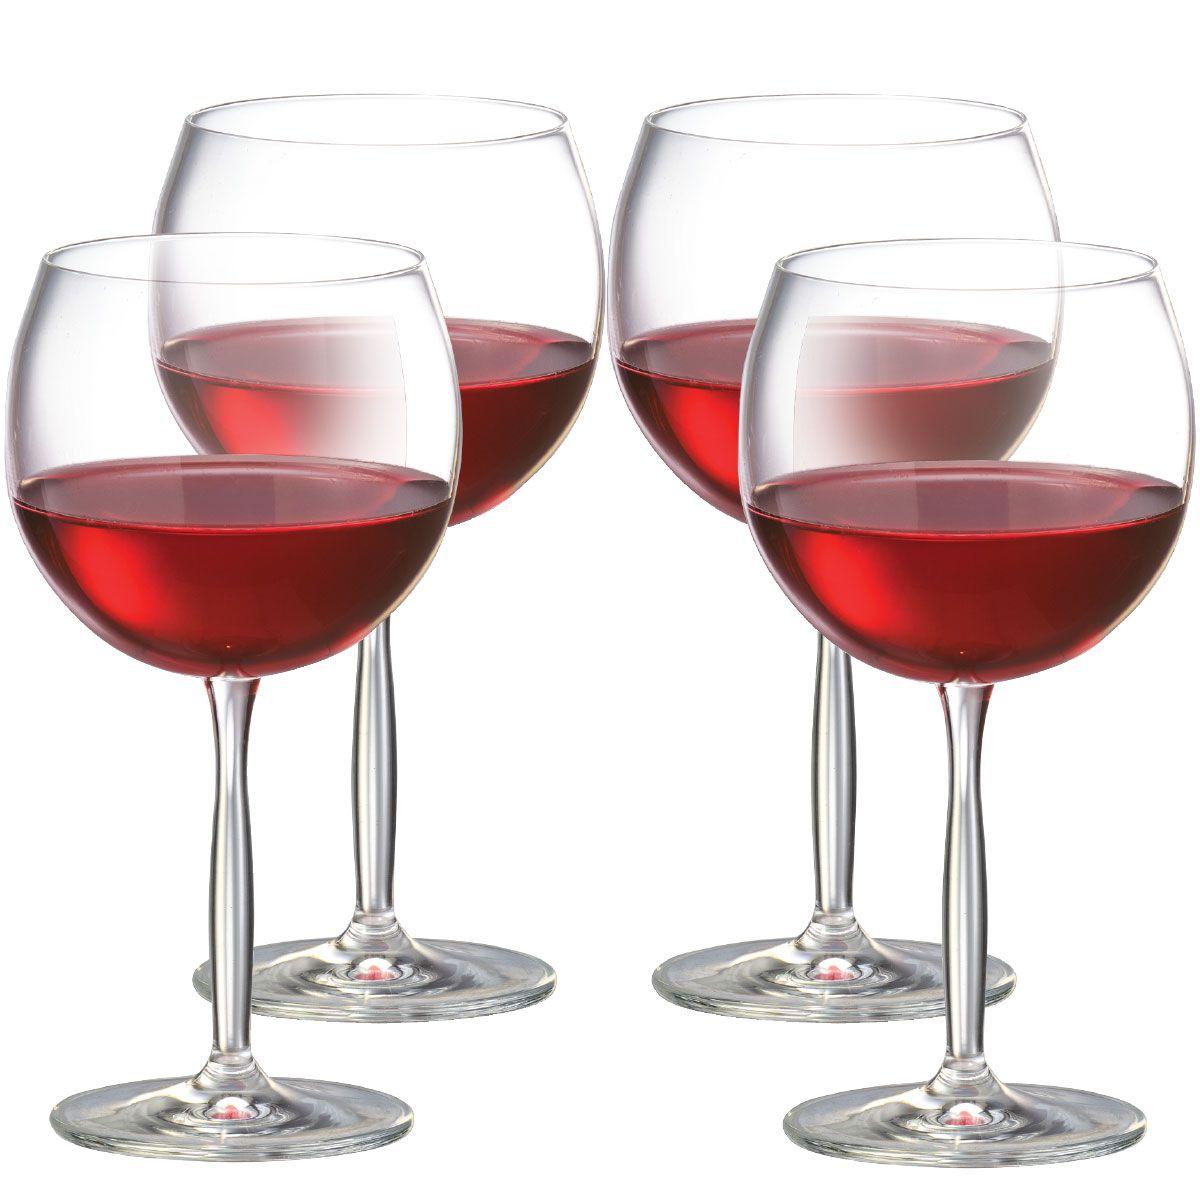 Jogo de Taça de Vinho Tinto Bordeaux Gran Cristal 550ml 4 Pcs